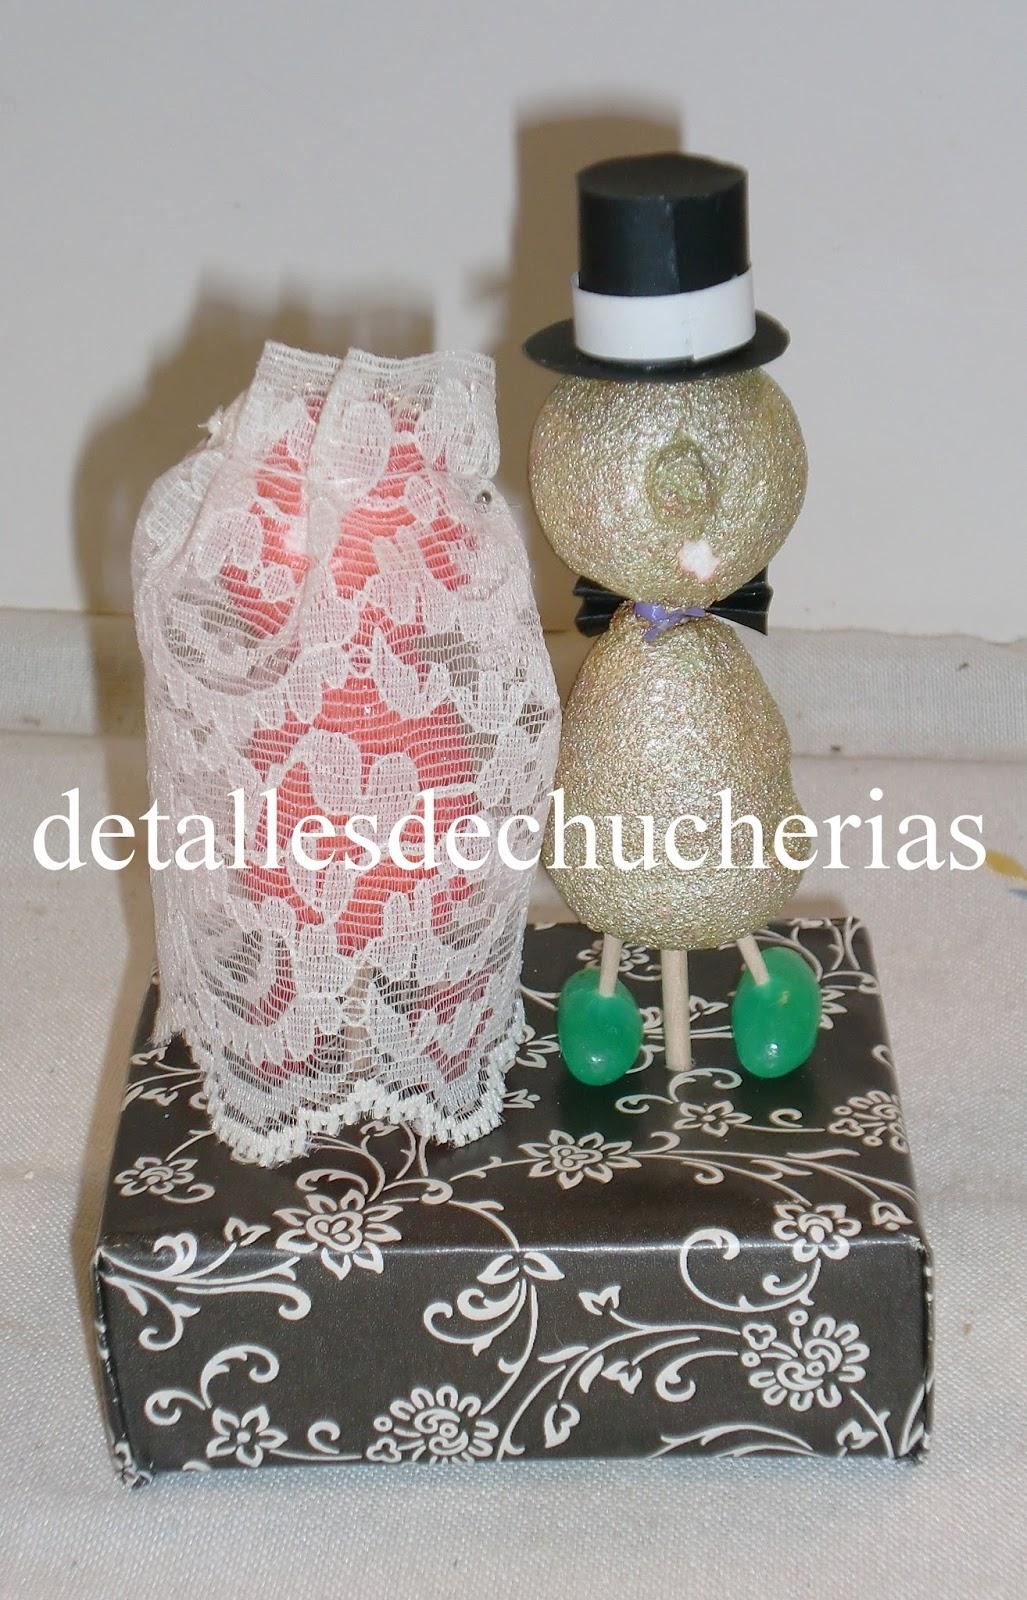 Detalles de chucherias detalles para aniversario for Detalles de aniversario de bodas